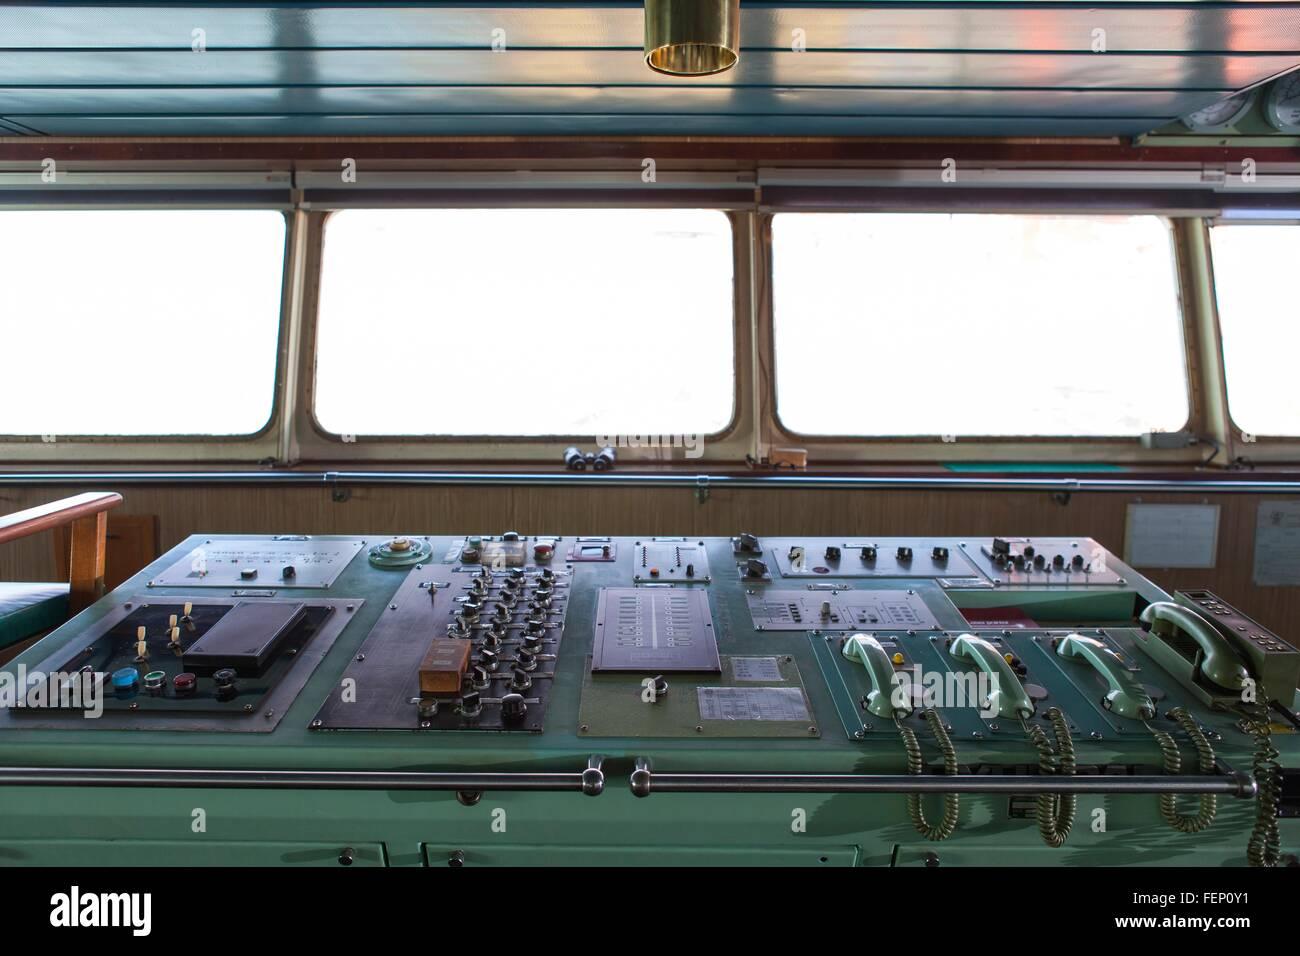 Control panel on board ship - Stock Image